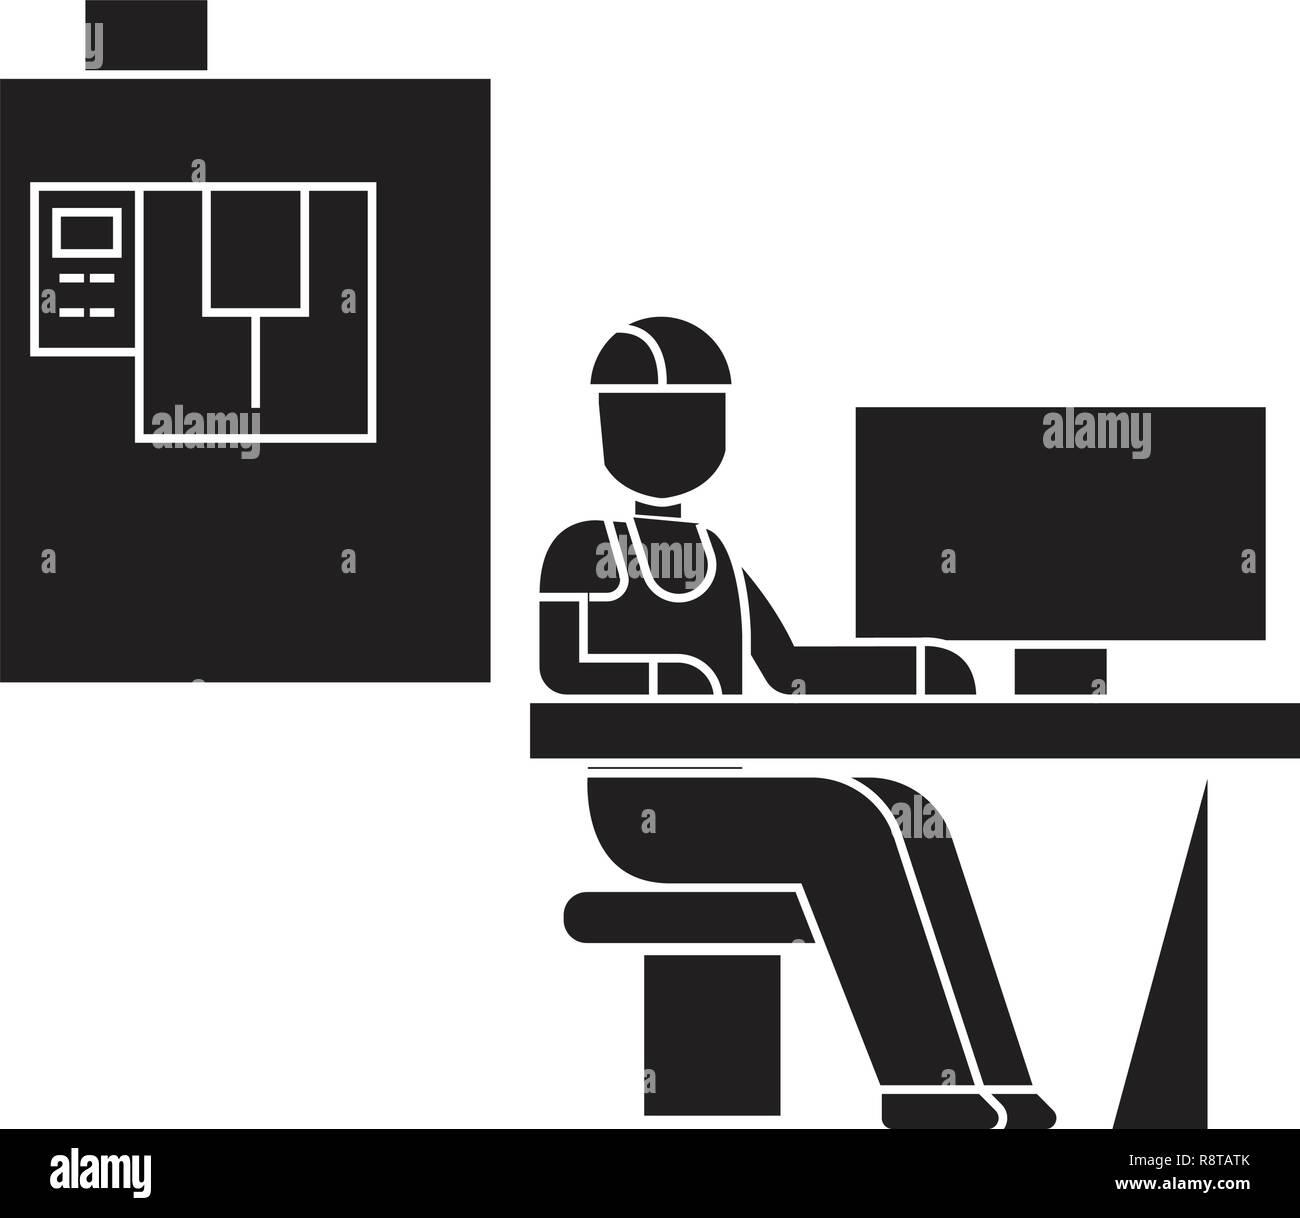 Lieu de travail technicien vecteur icône noire concept. Lieu de travail technicien télévision illustration, sign Illustration de Vecteur